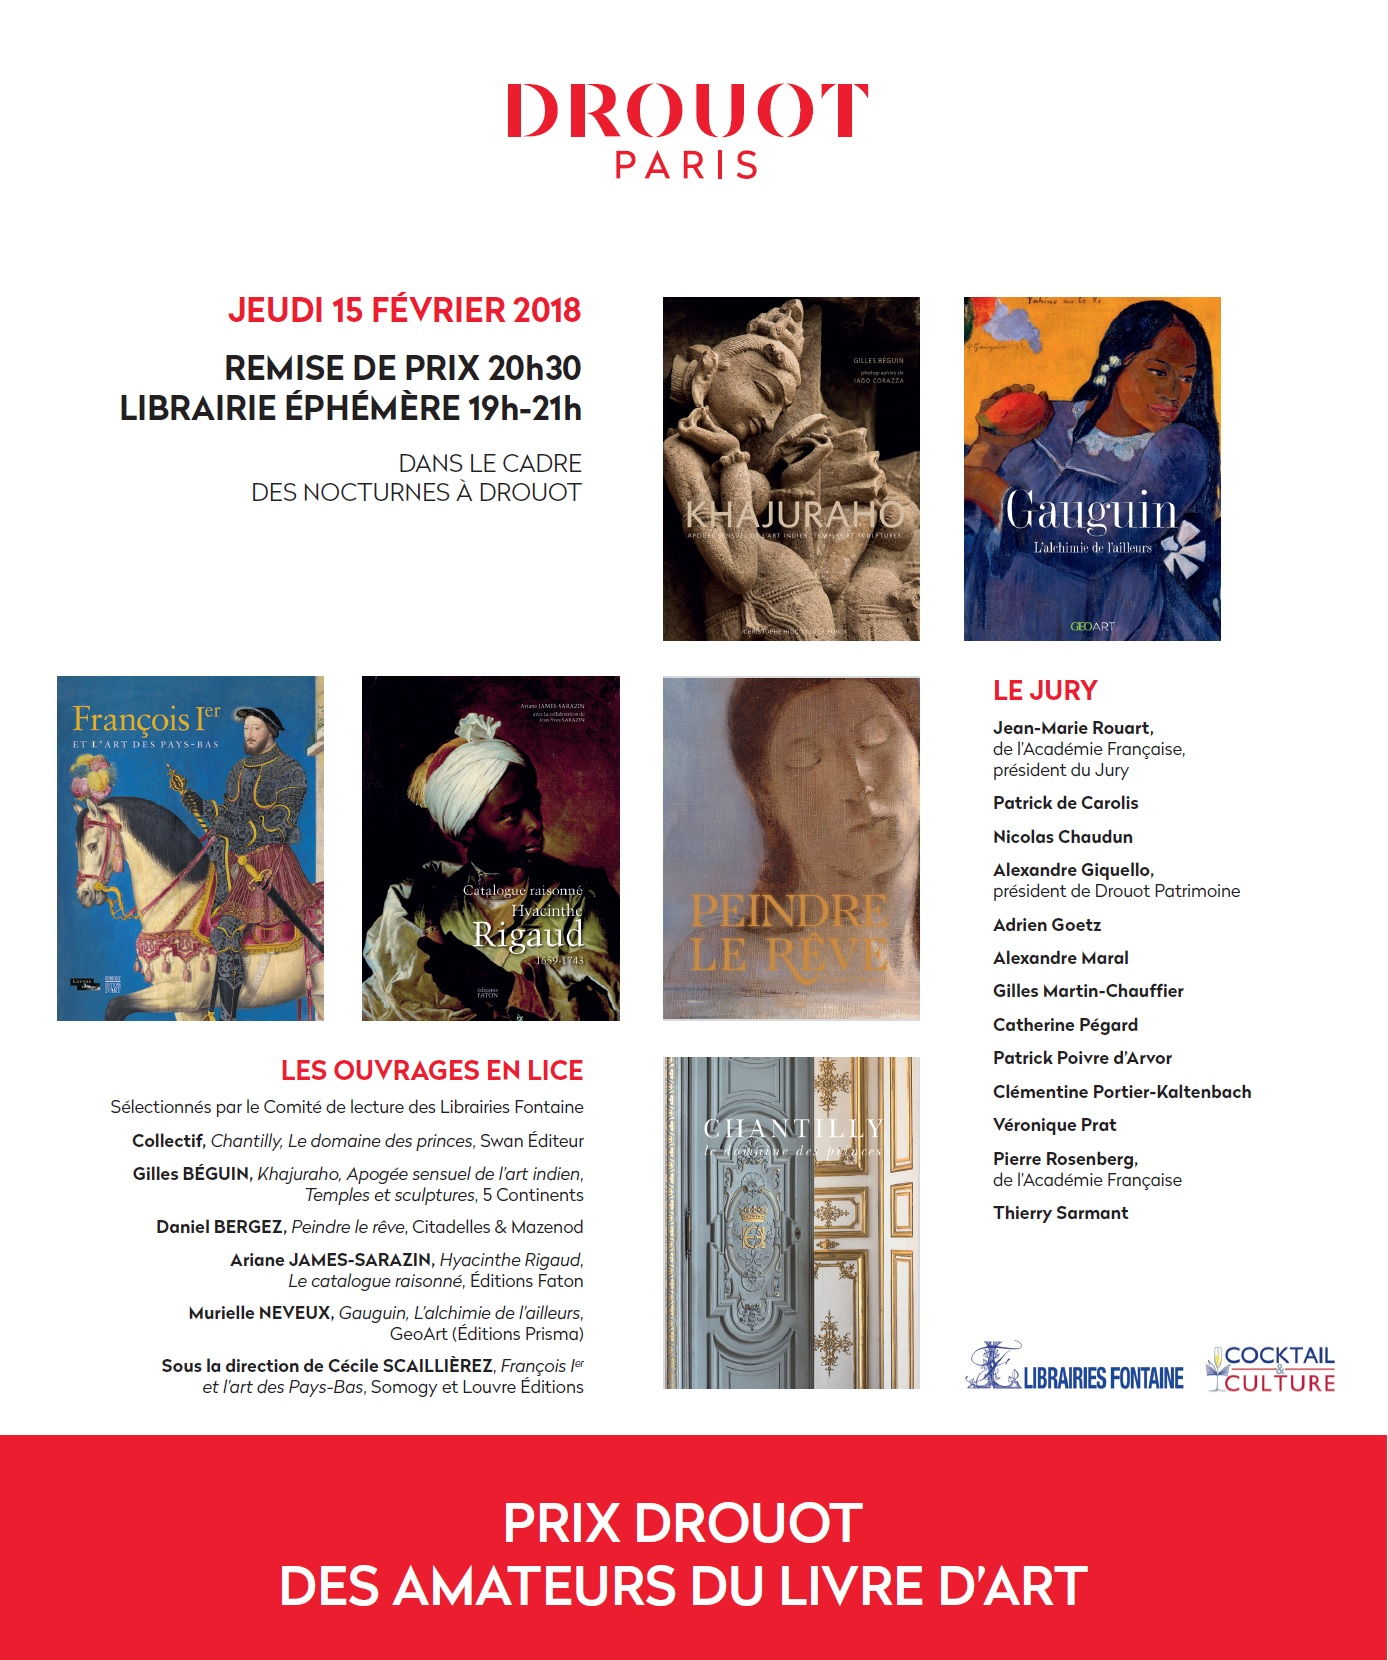 Gazette de Drouot - Finalistes Prix Drouot 2018